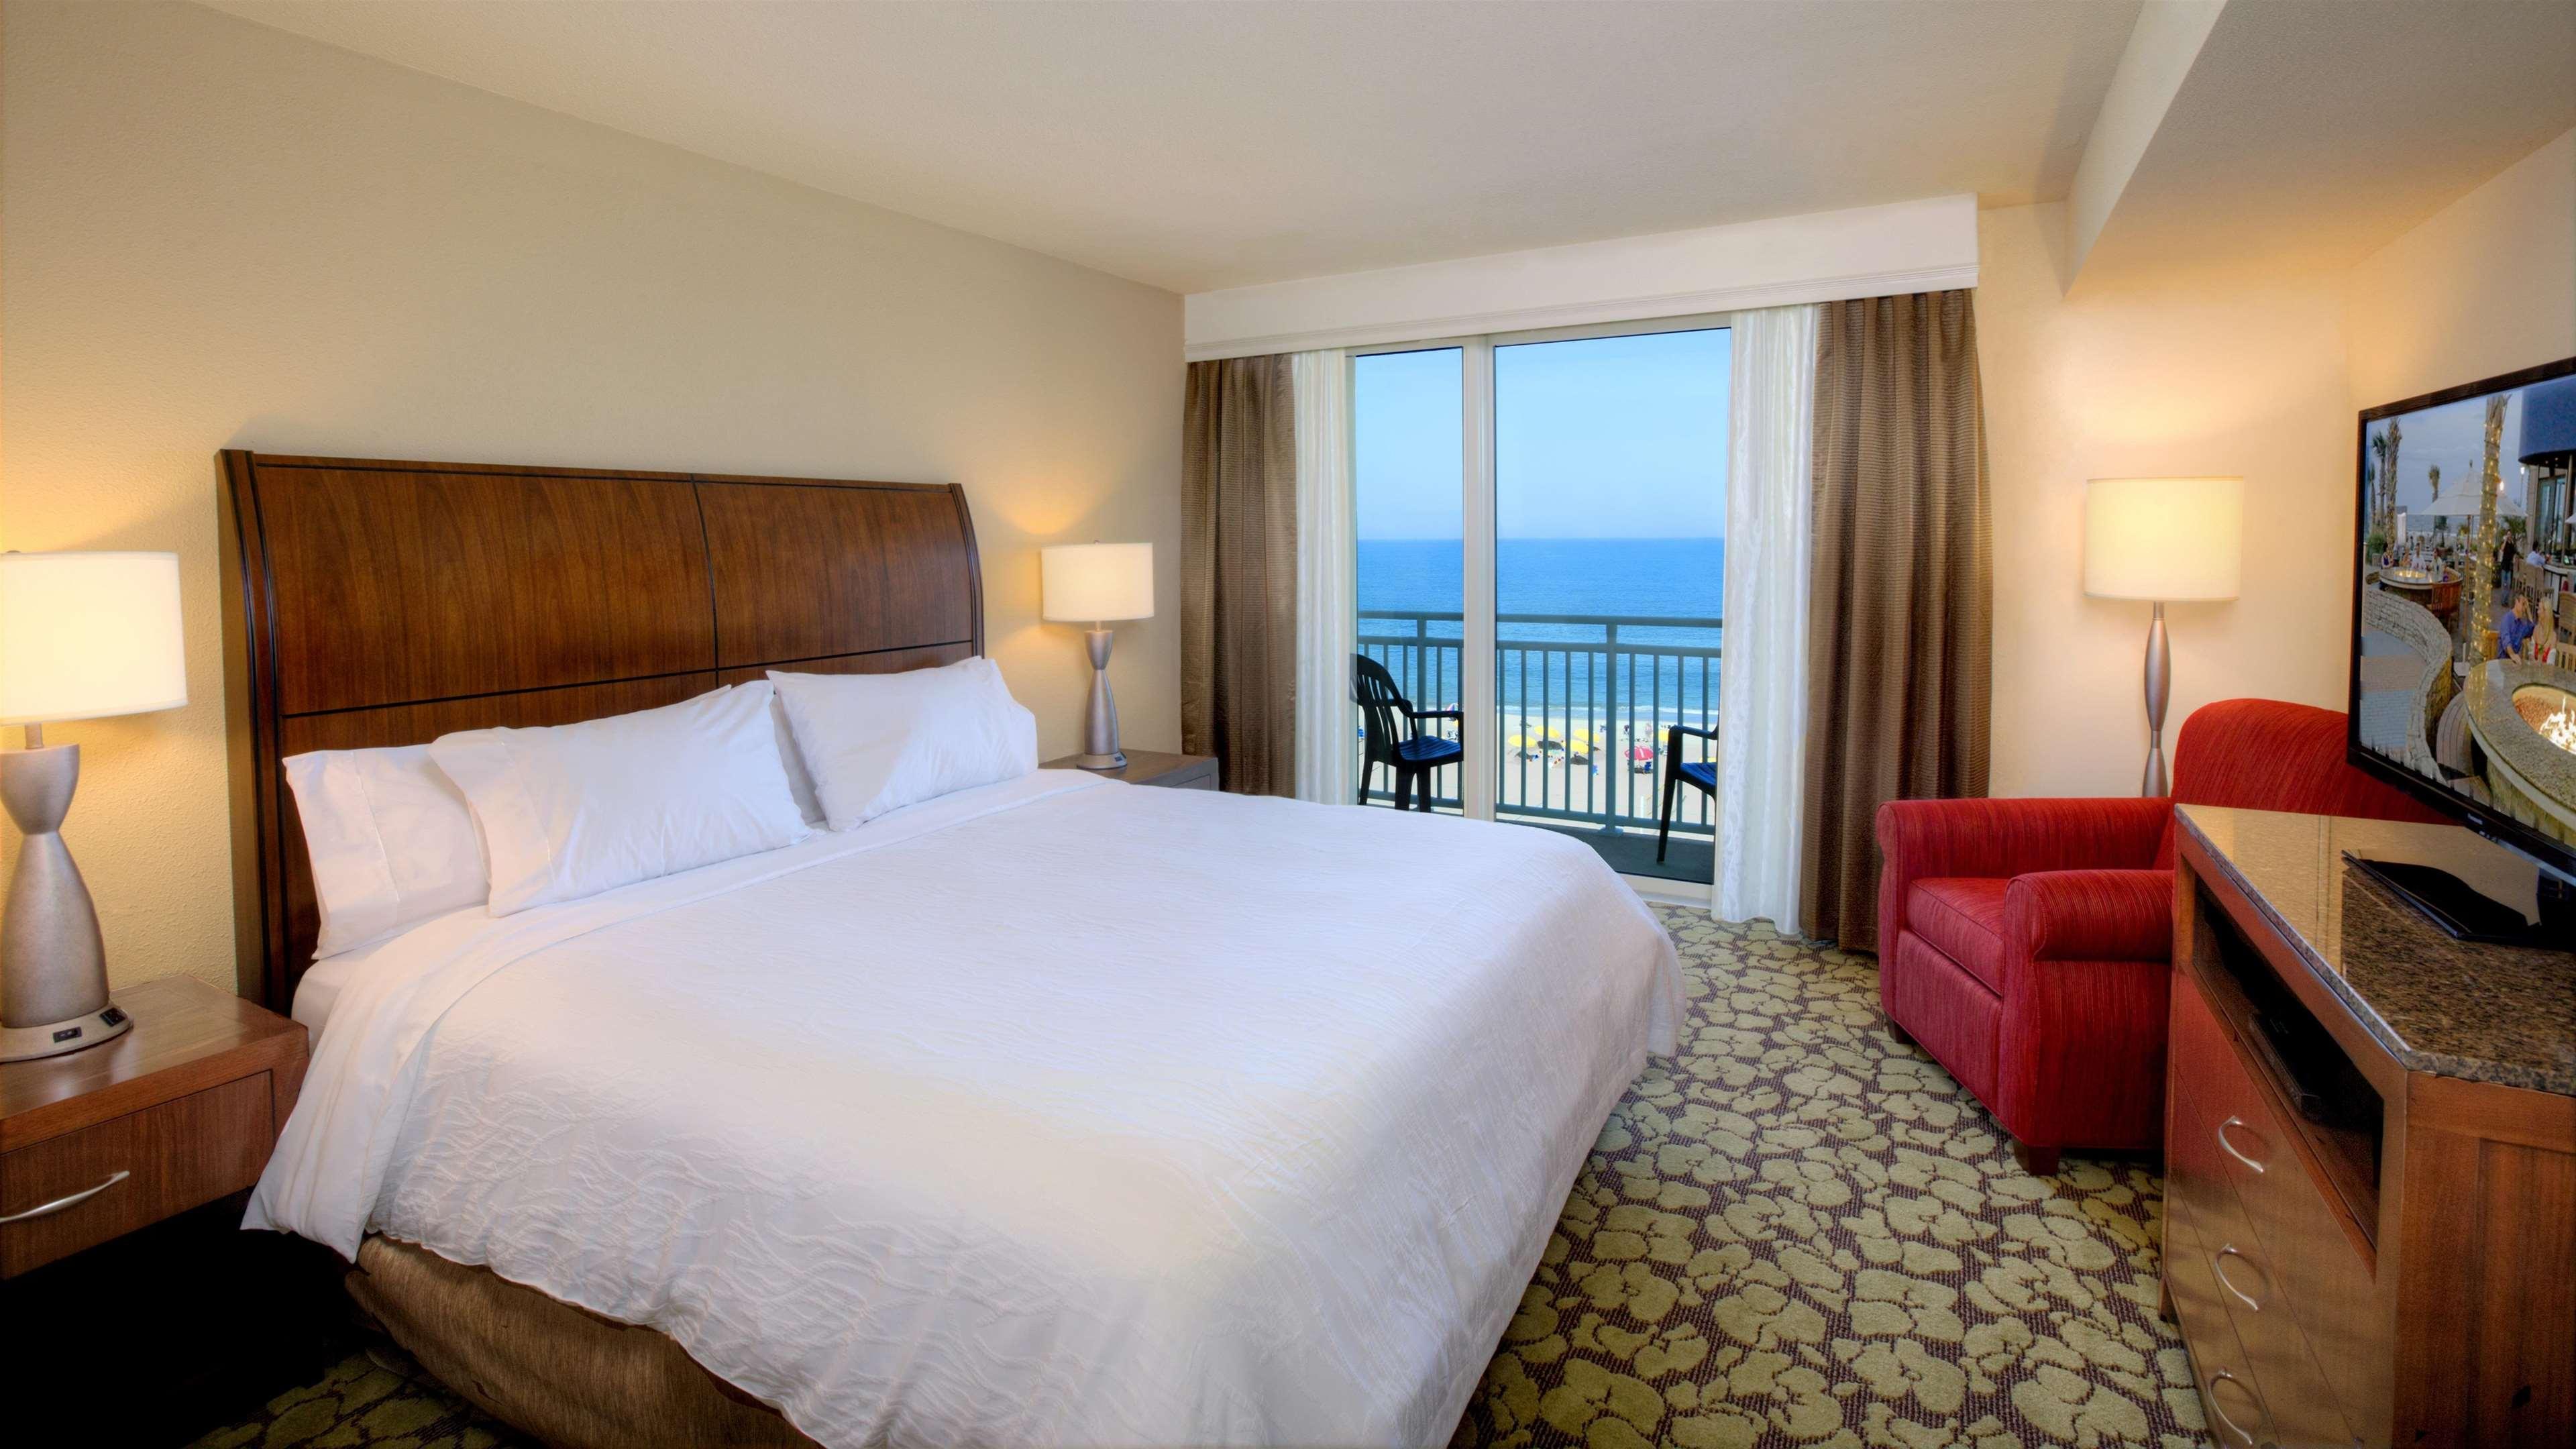 Hilton Garden Inn Virginia Beach Oceanfront image 28